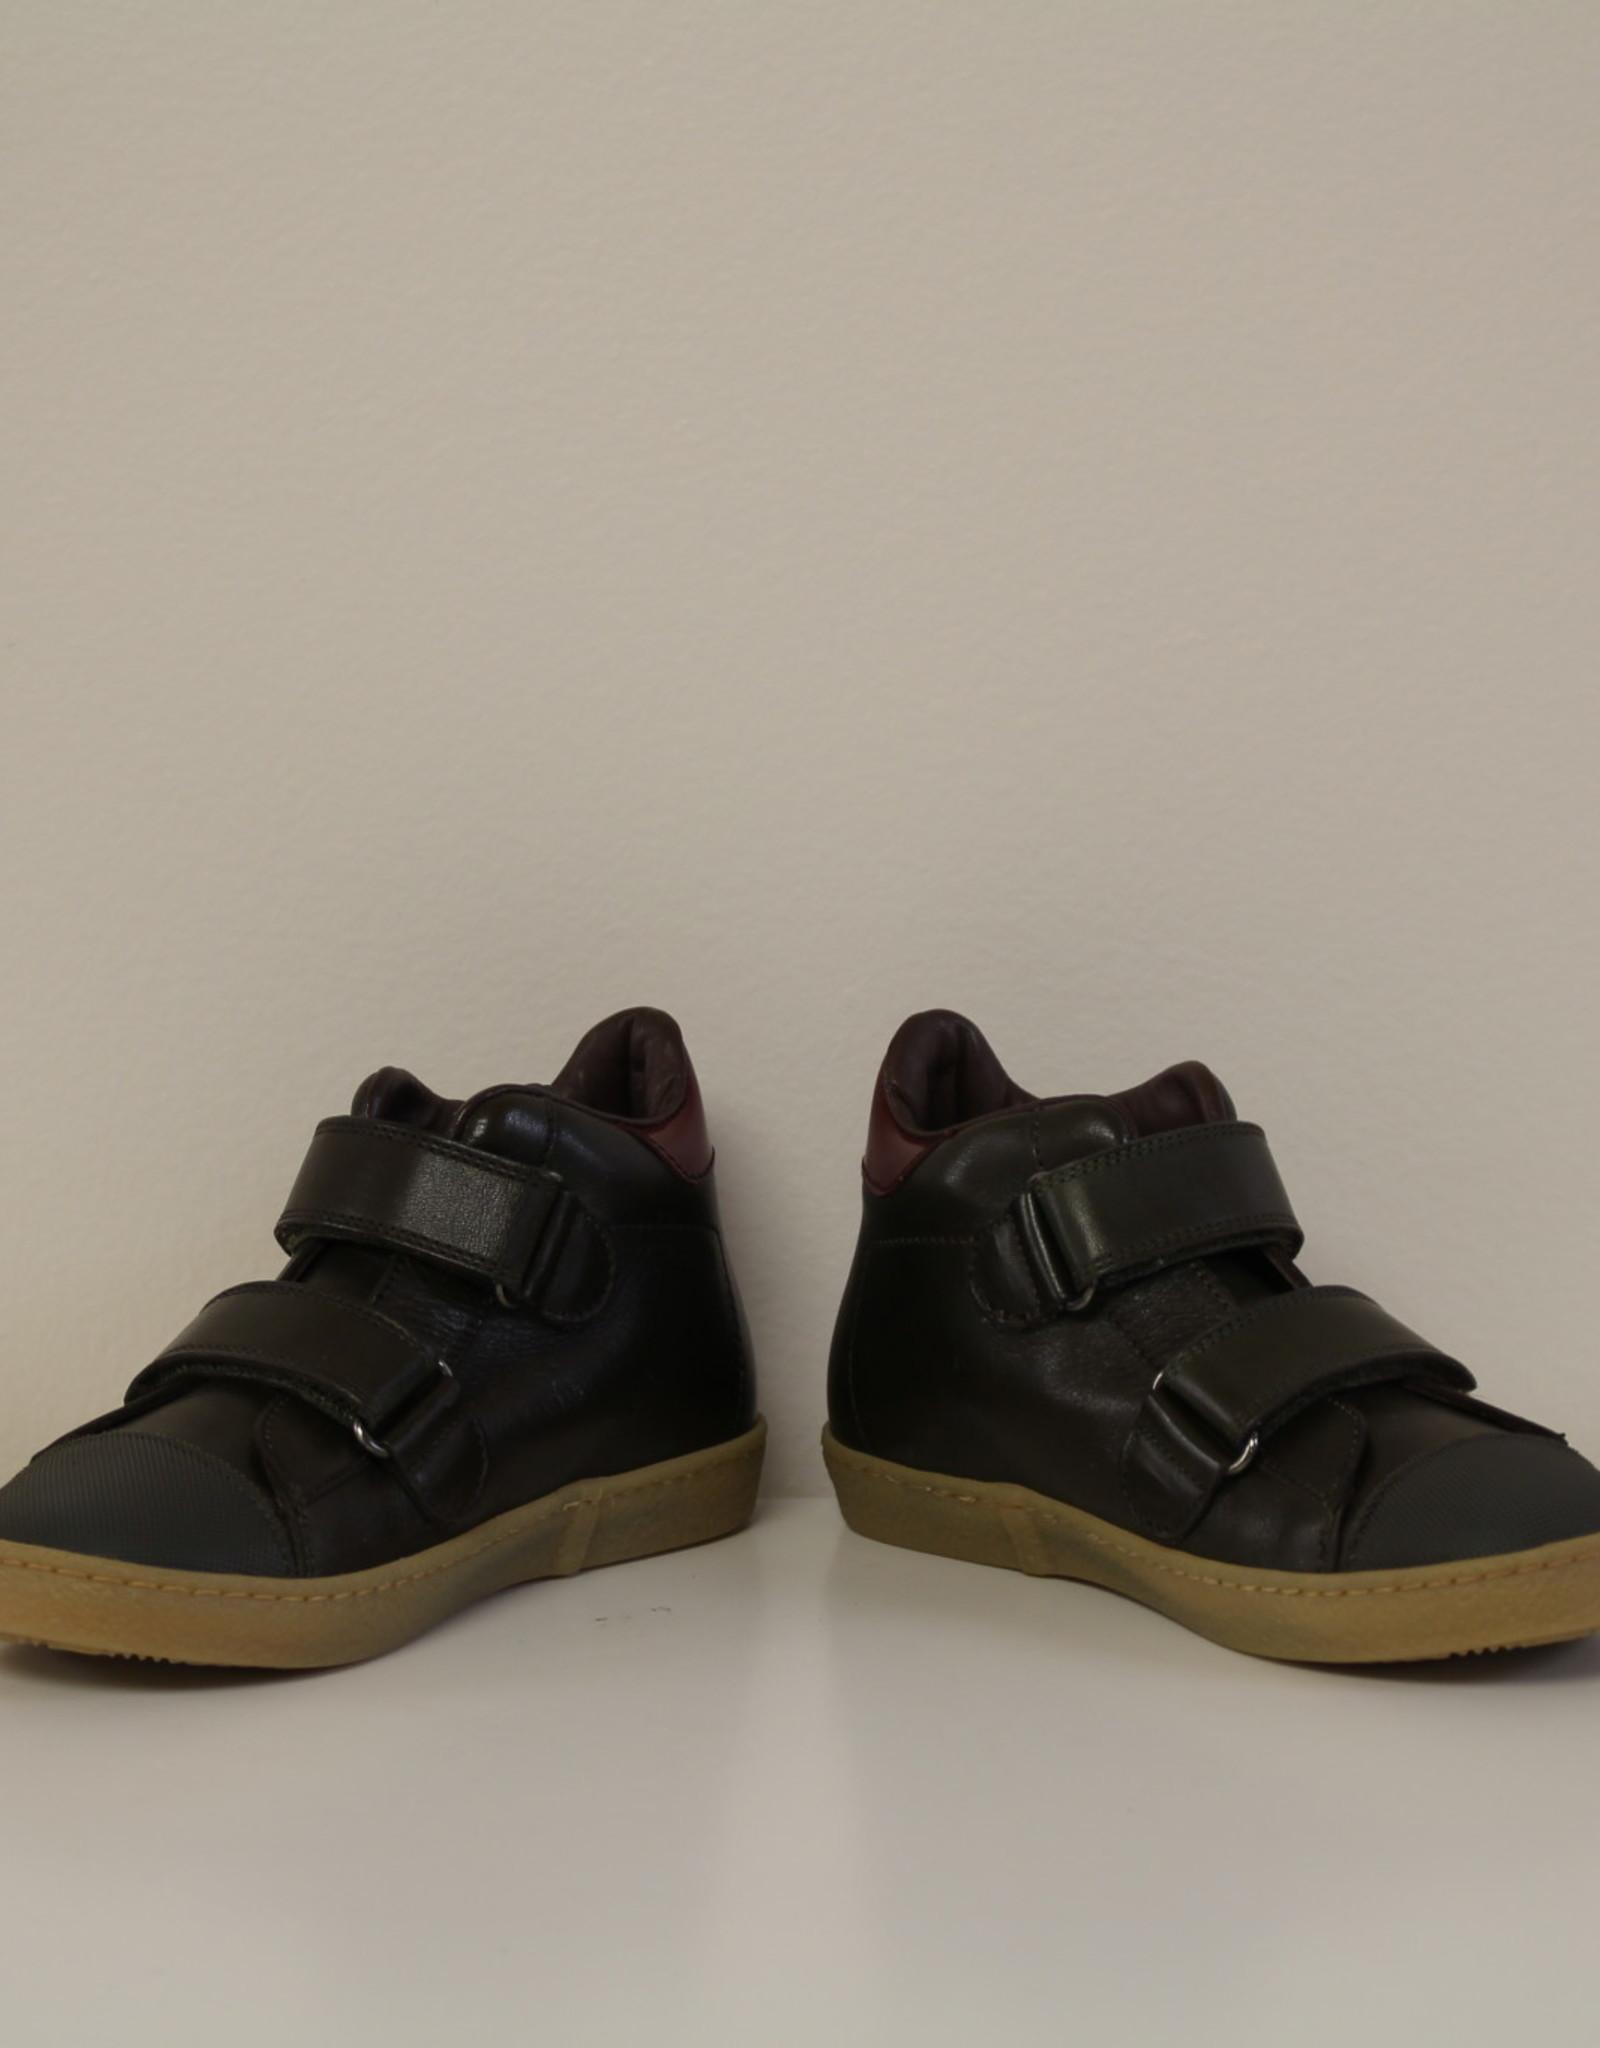 Rondinella 11091-3 sneaker velcro